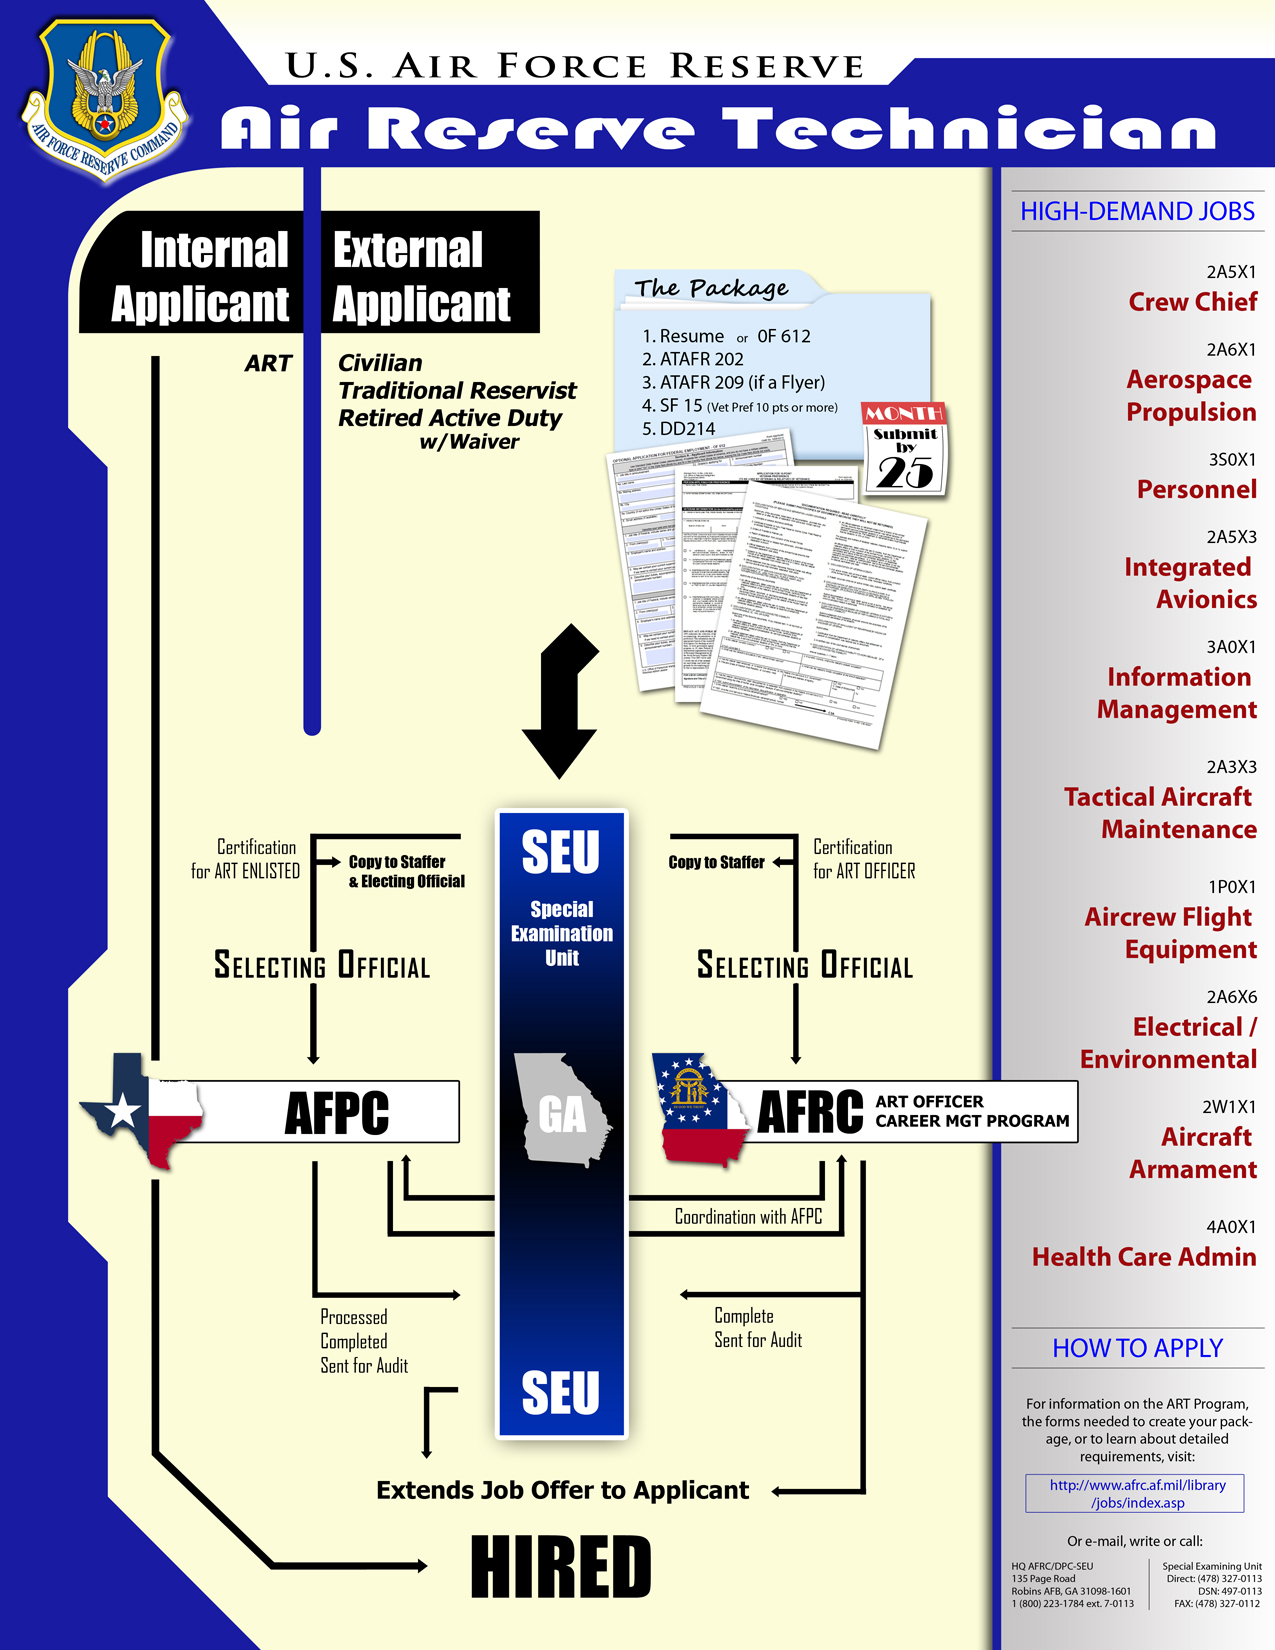 Hiring an ART - Pt 2: The process > 22nd Air Force > Article Display